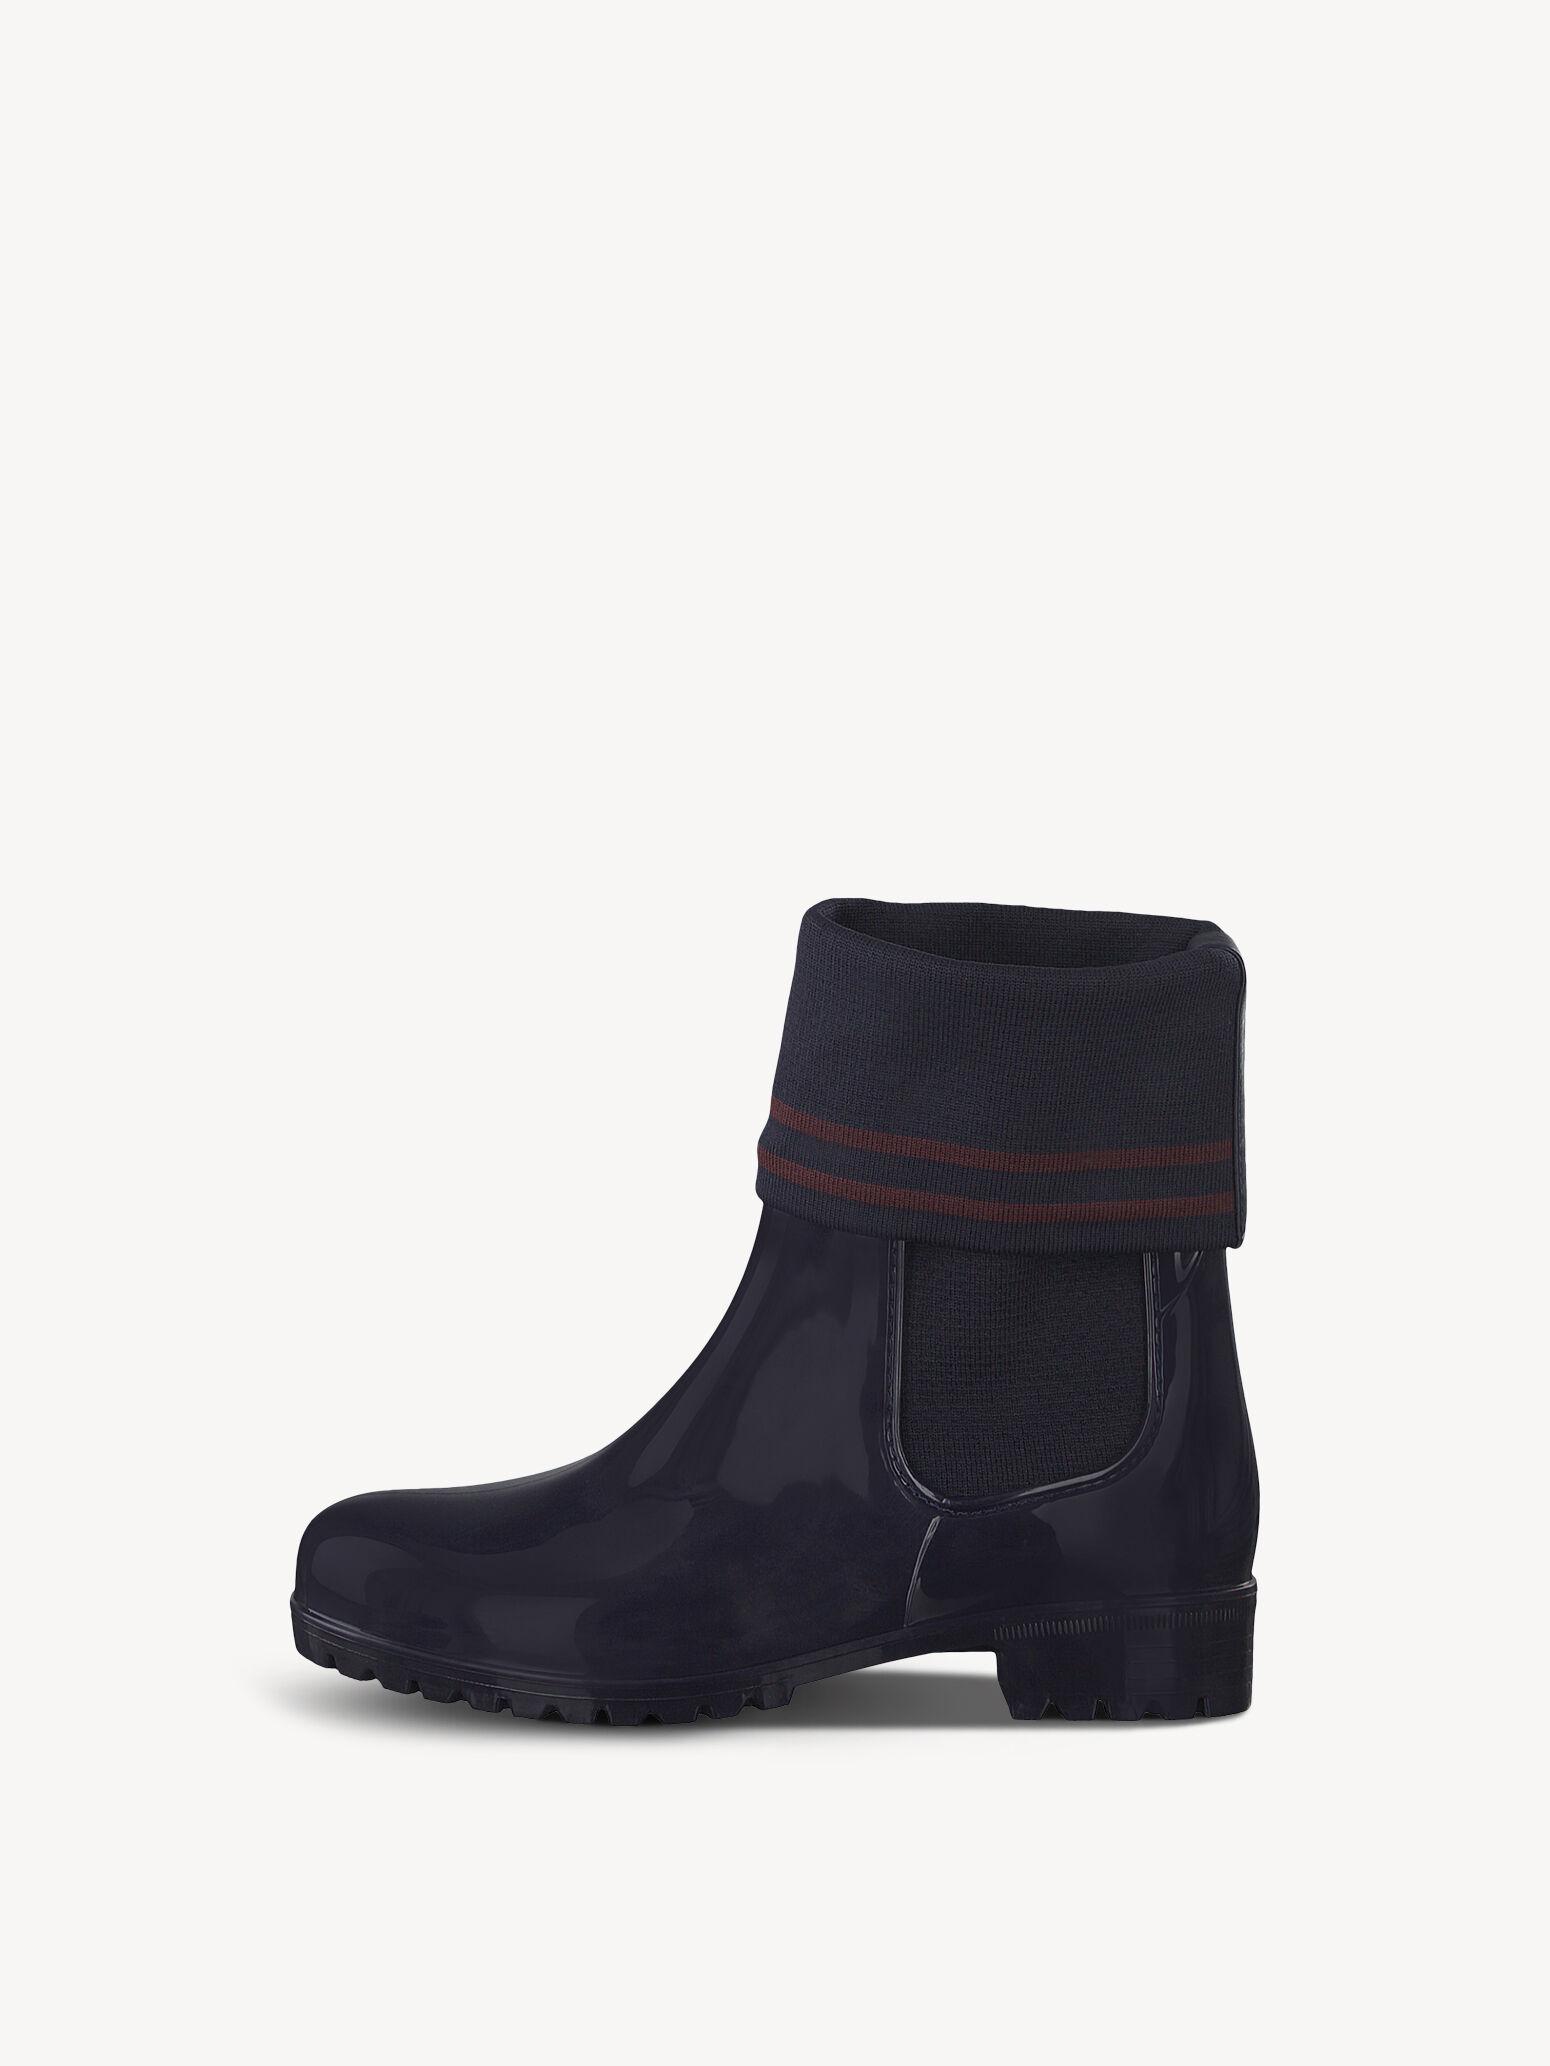 Gabor 75 642 Schuhe Damen Stiefeletten Ankle Boots